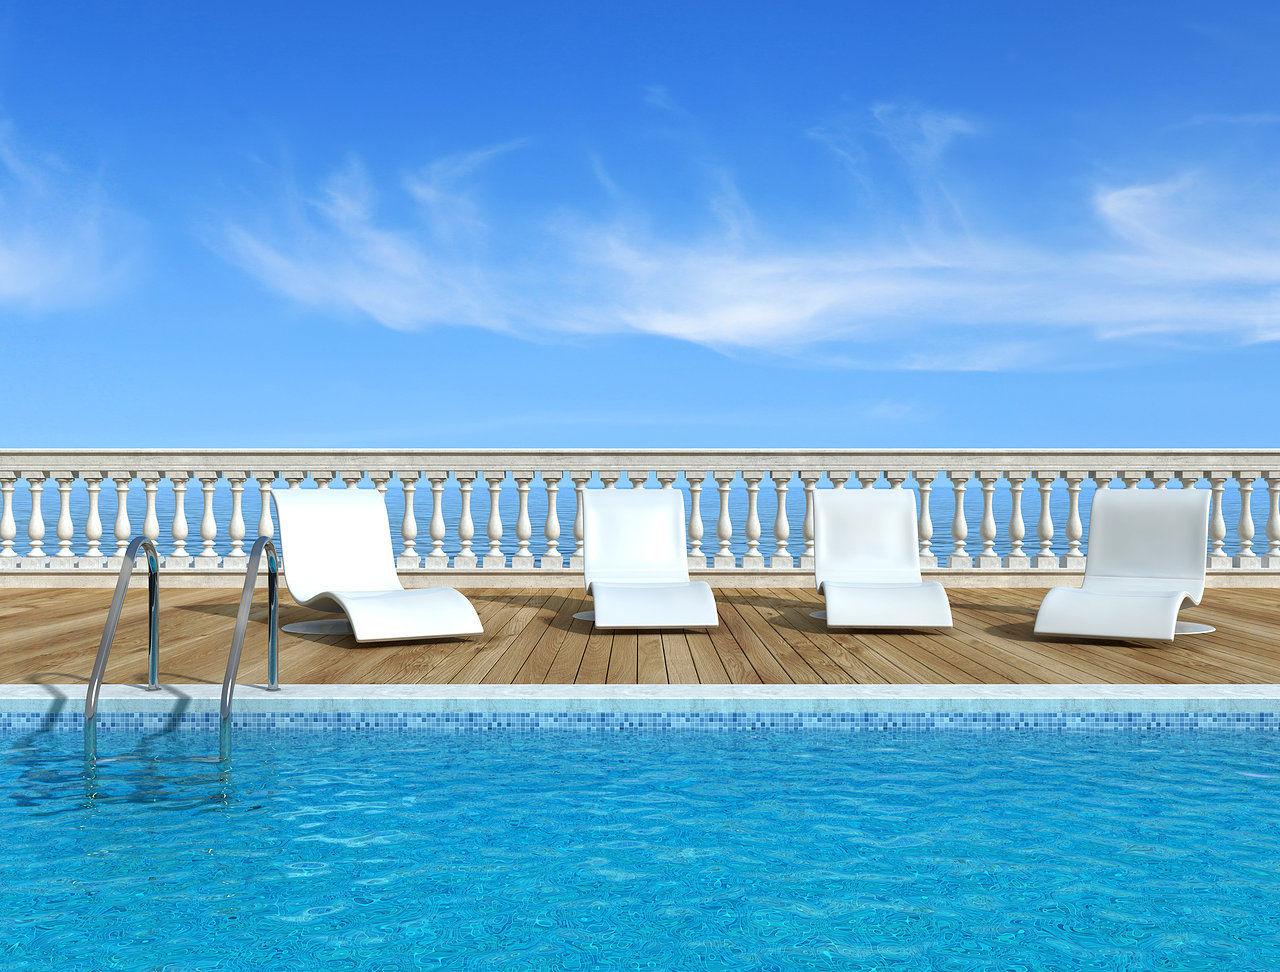 Hotel Excelsior Torino